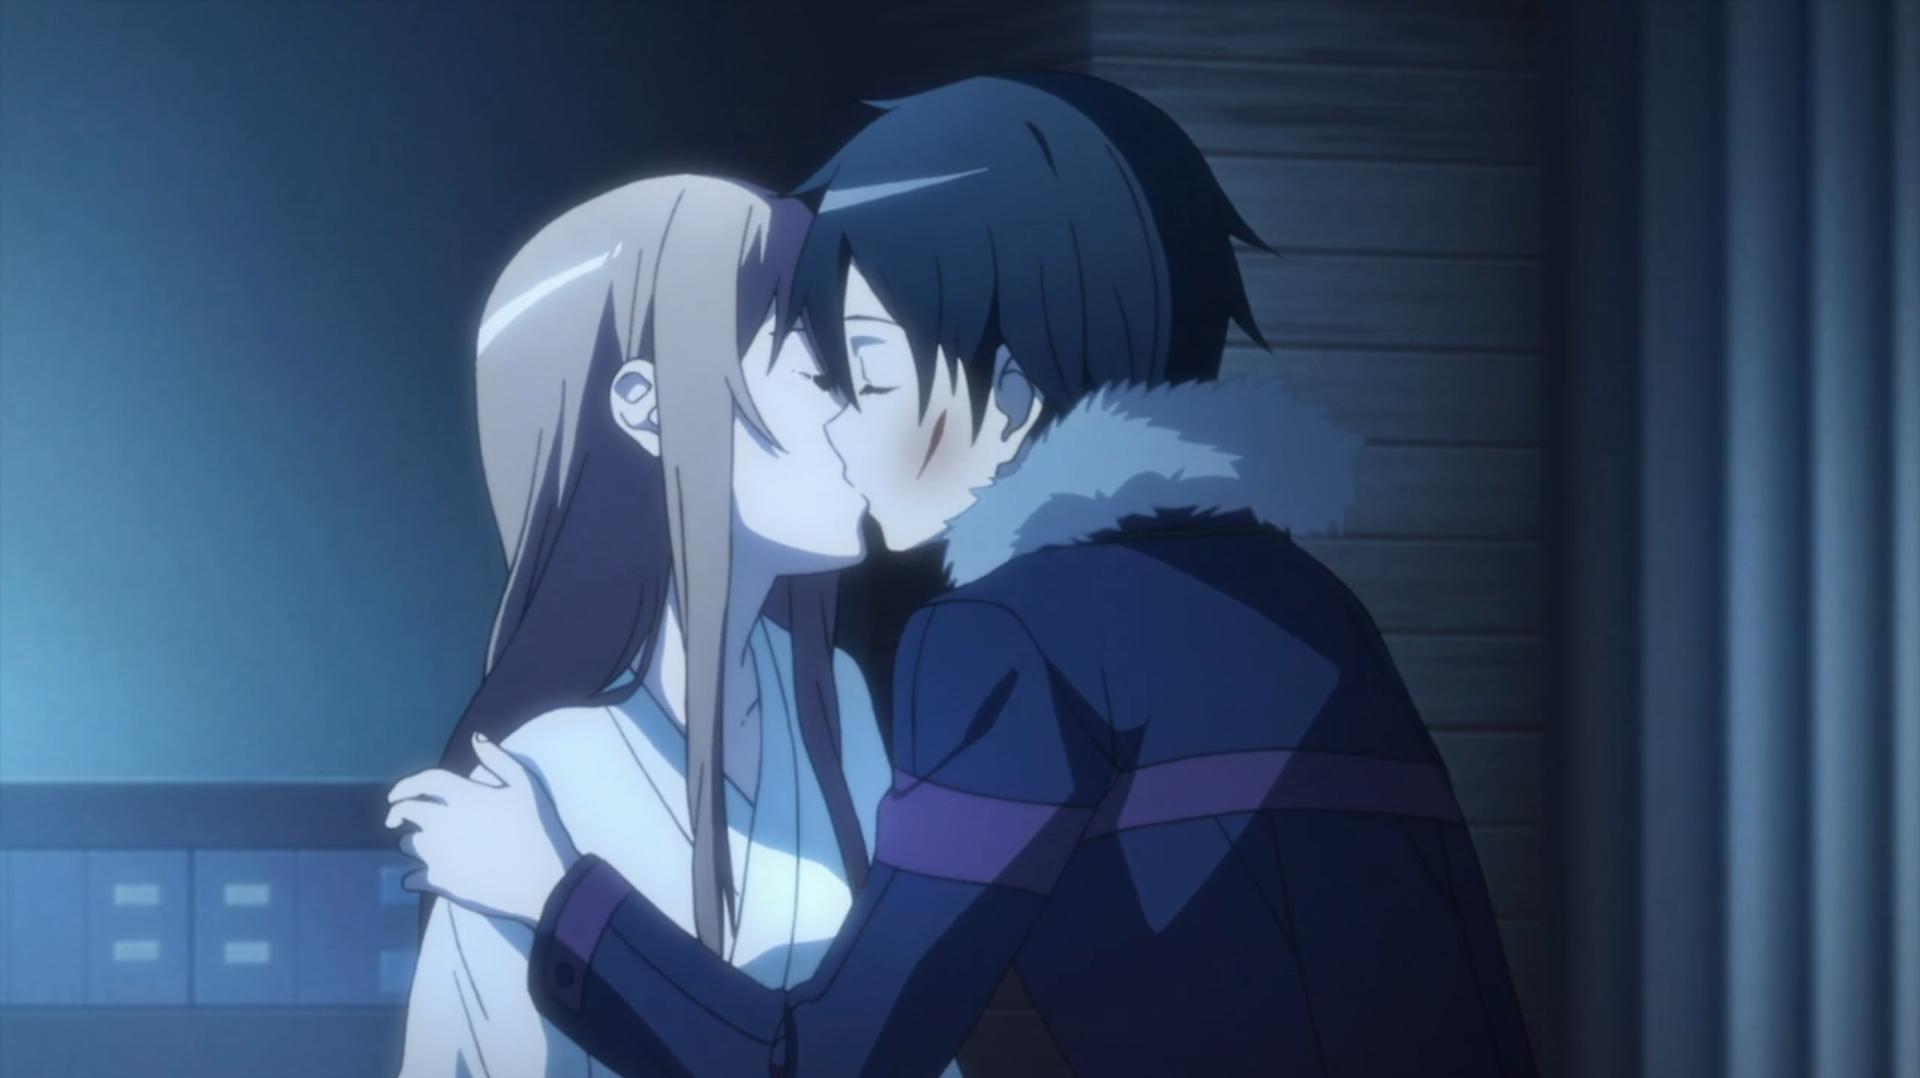 asuna and yuuki relationship questions